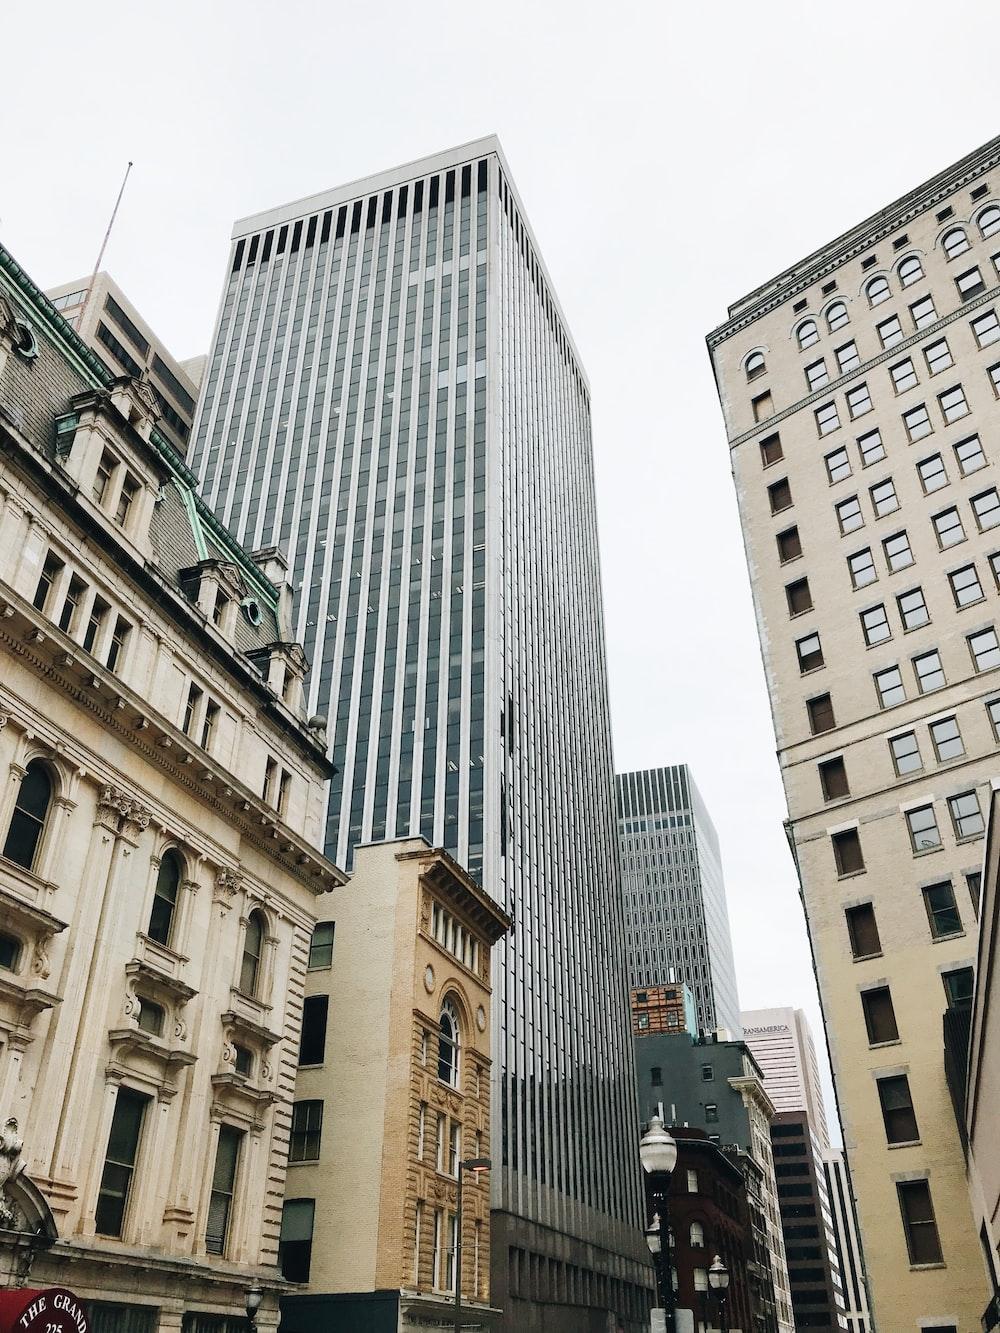 high rise city buildings